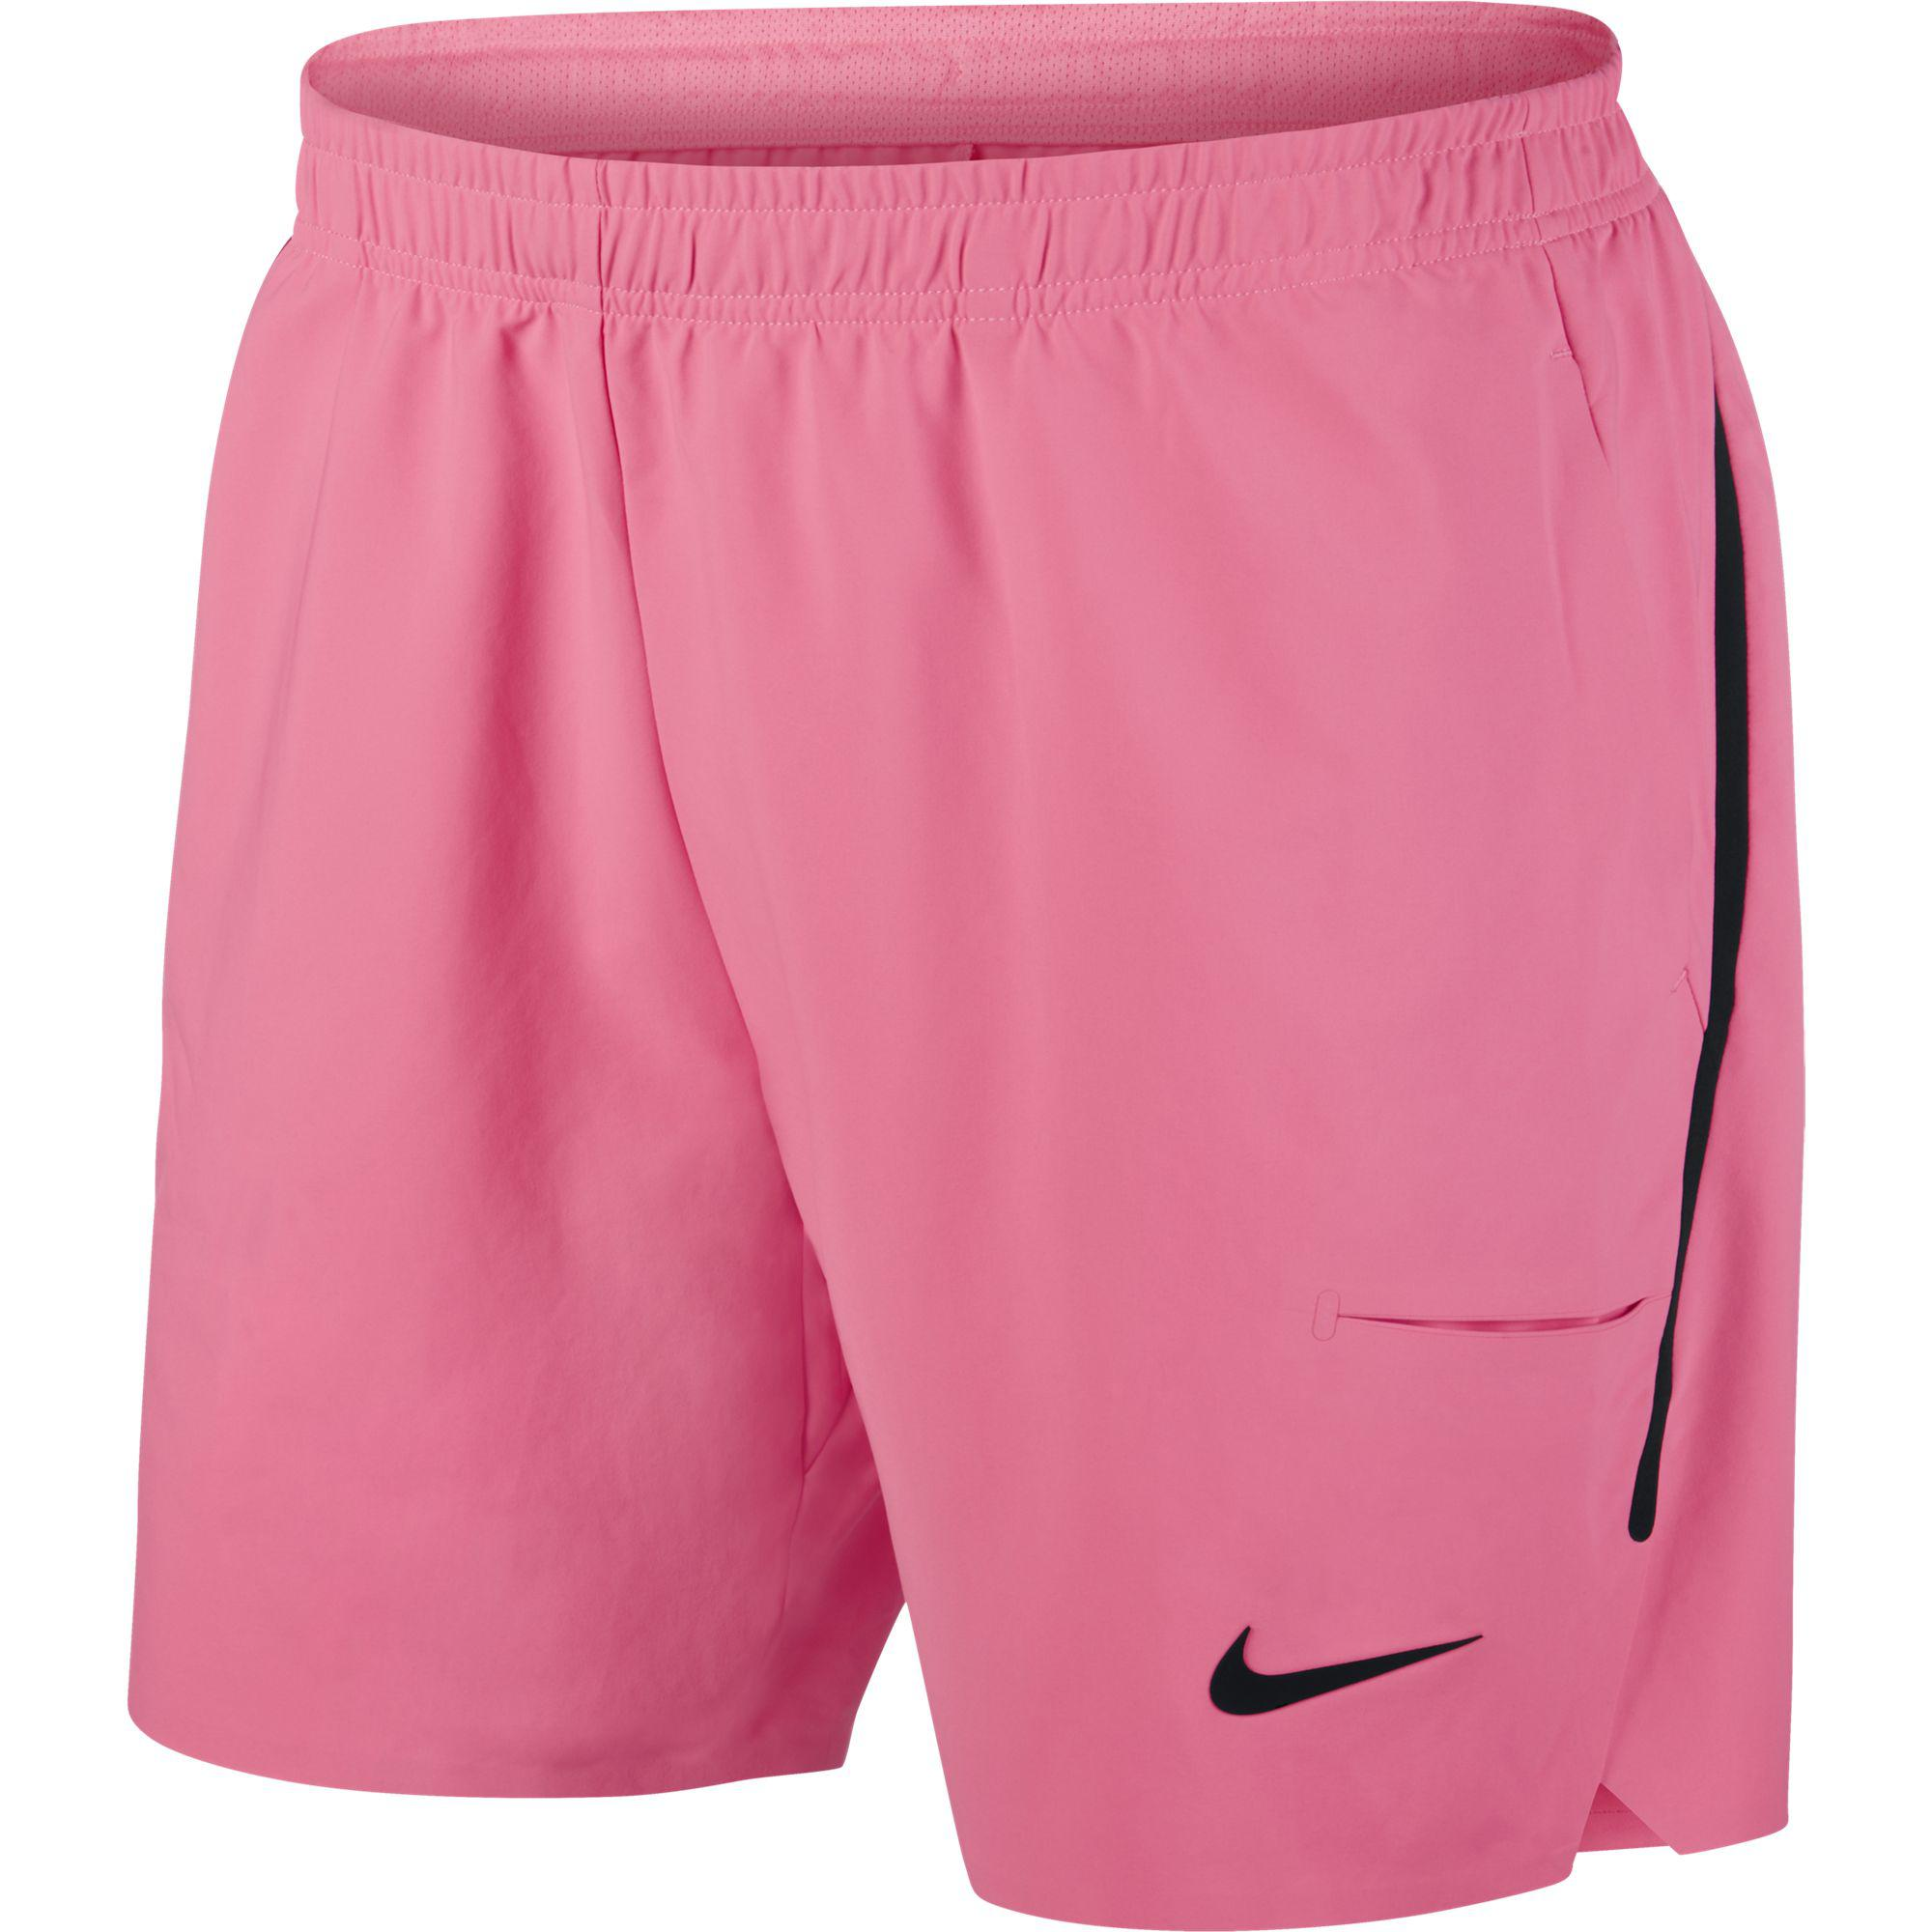 ee66c6a69c2a Nike Mens Court Flex Ace 7 Inch Shorts - Sunset Pulse Black - Tennisnuts.com